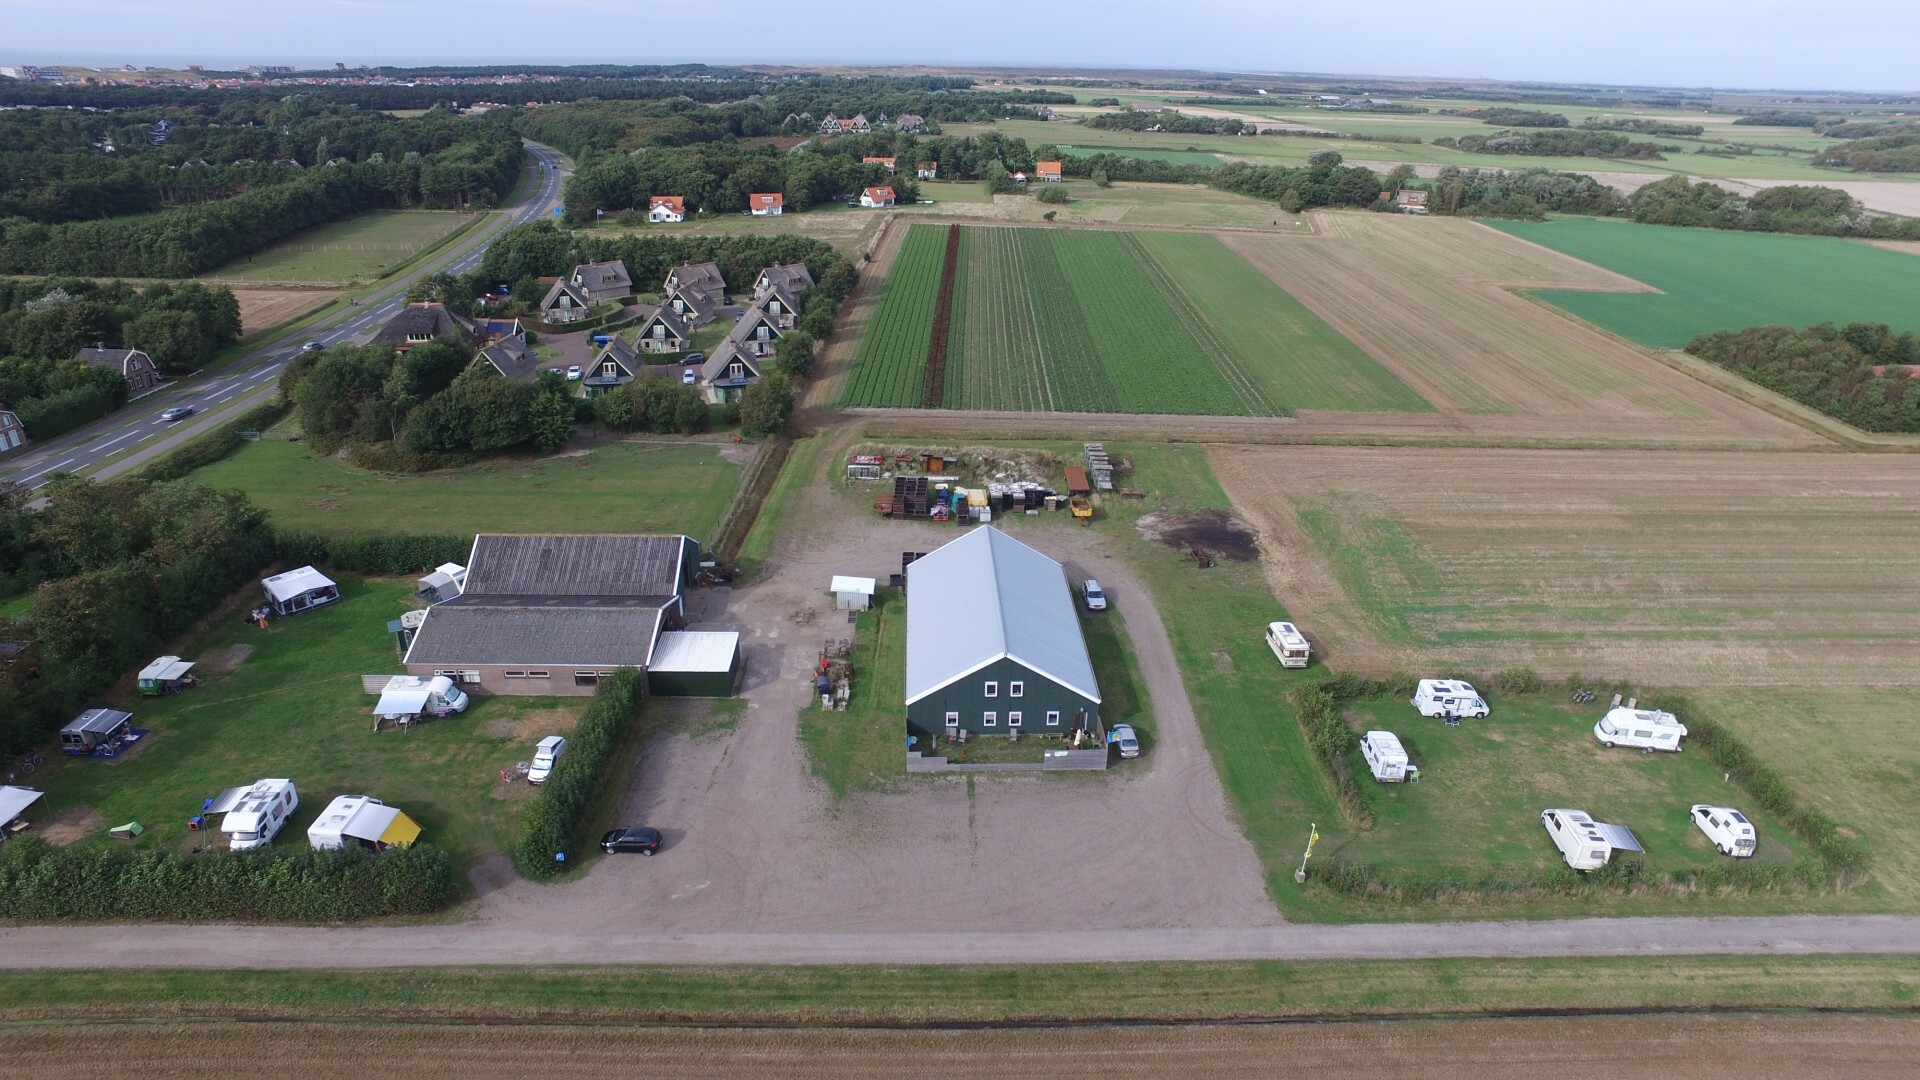 Camping De Vrolijke Zwaluw bij De Cocksdorp VVV Texel